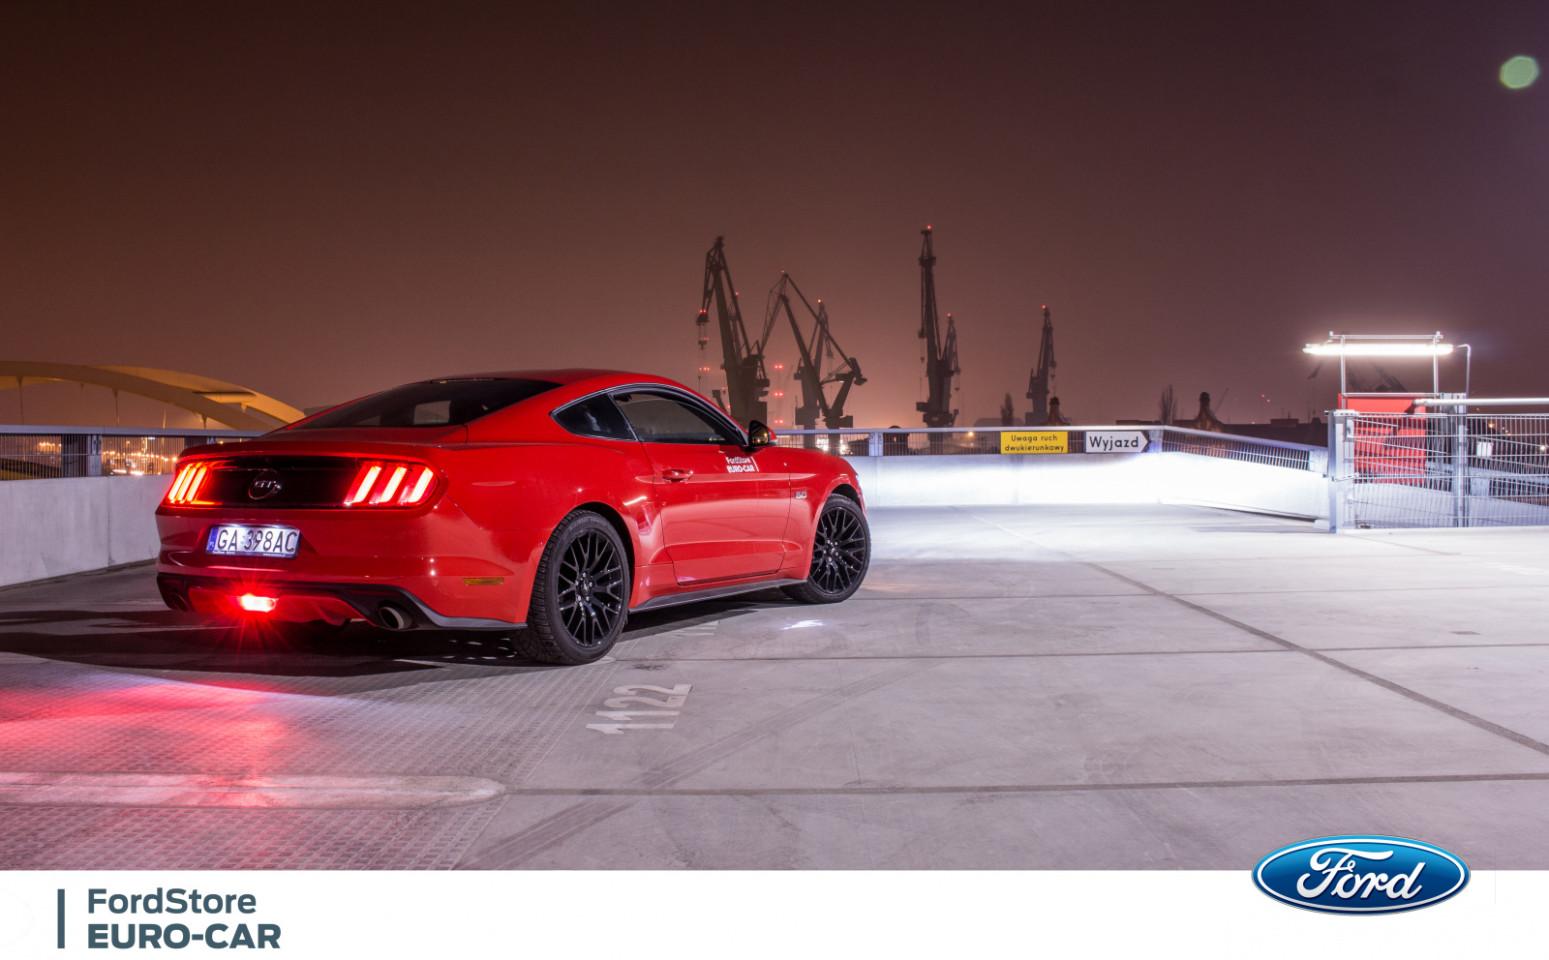 Ford Mustang V8 FordStore Euro-Car